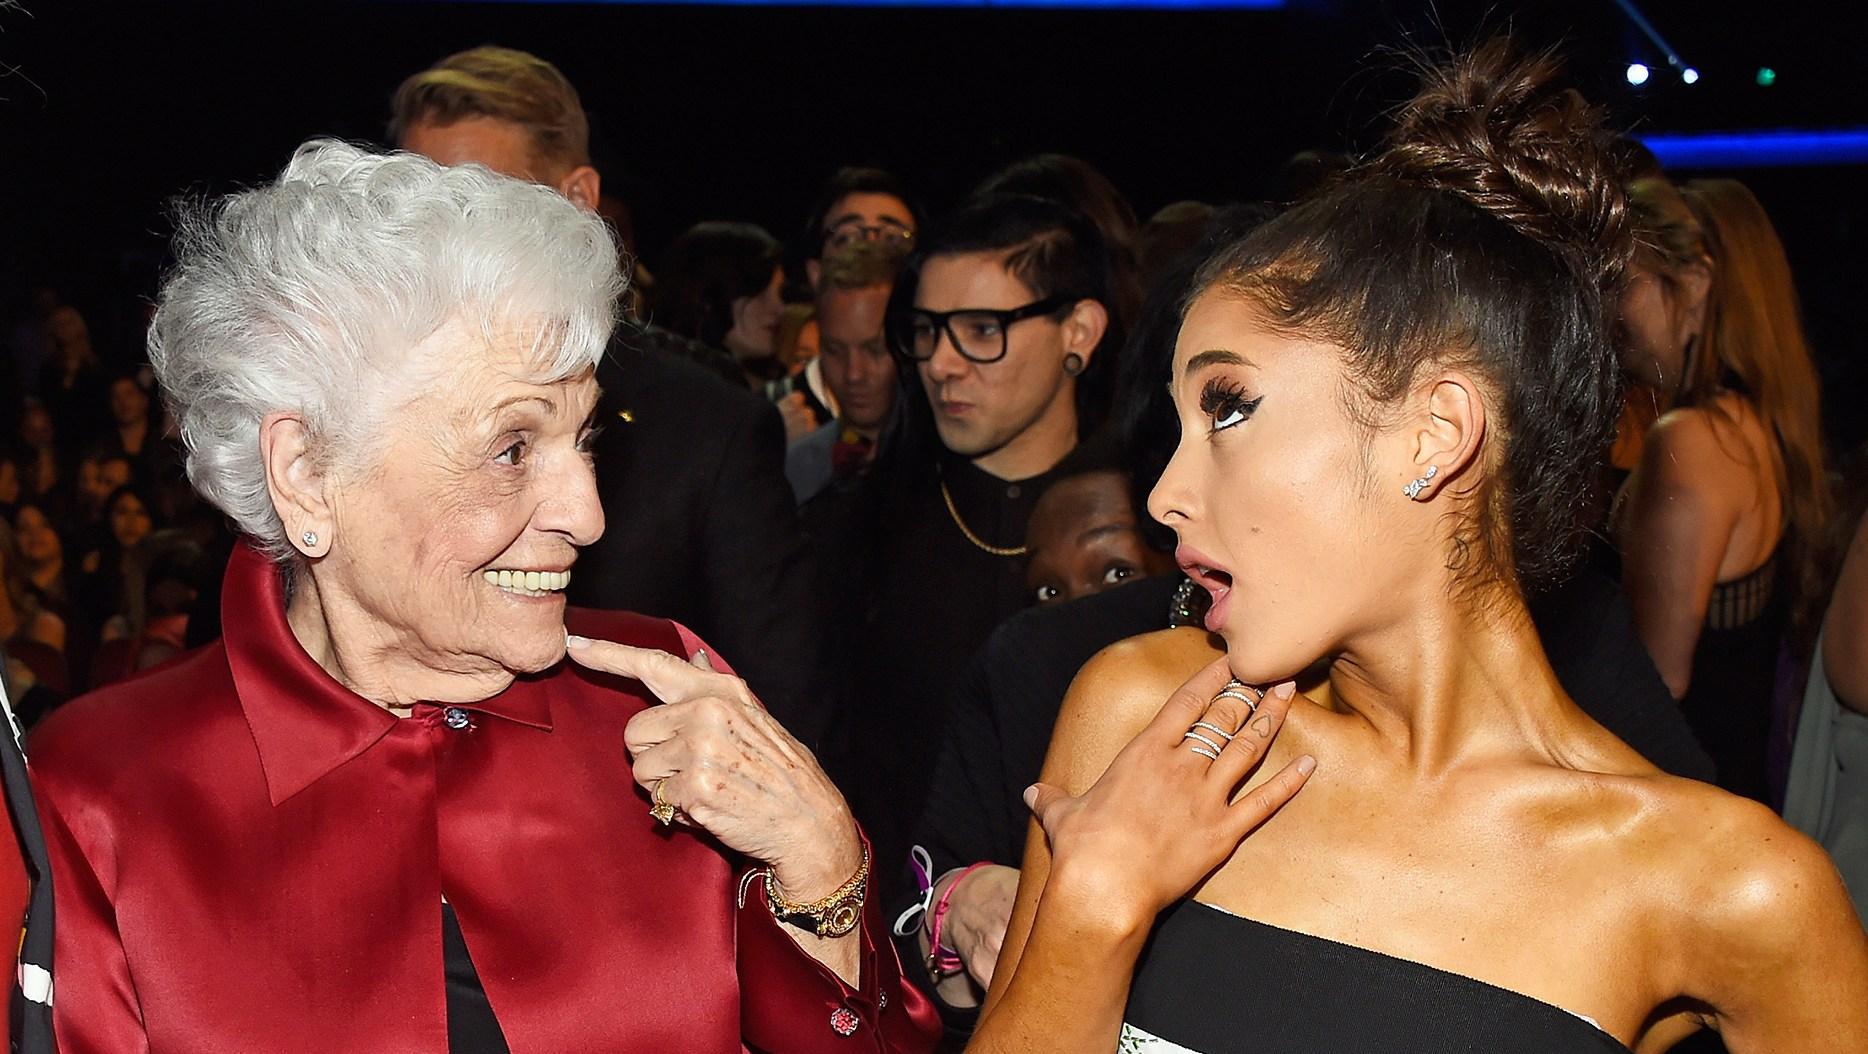 Ariana Grande Nonna Tattoos